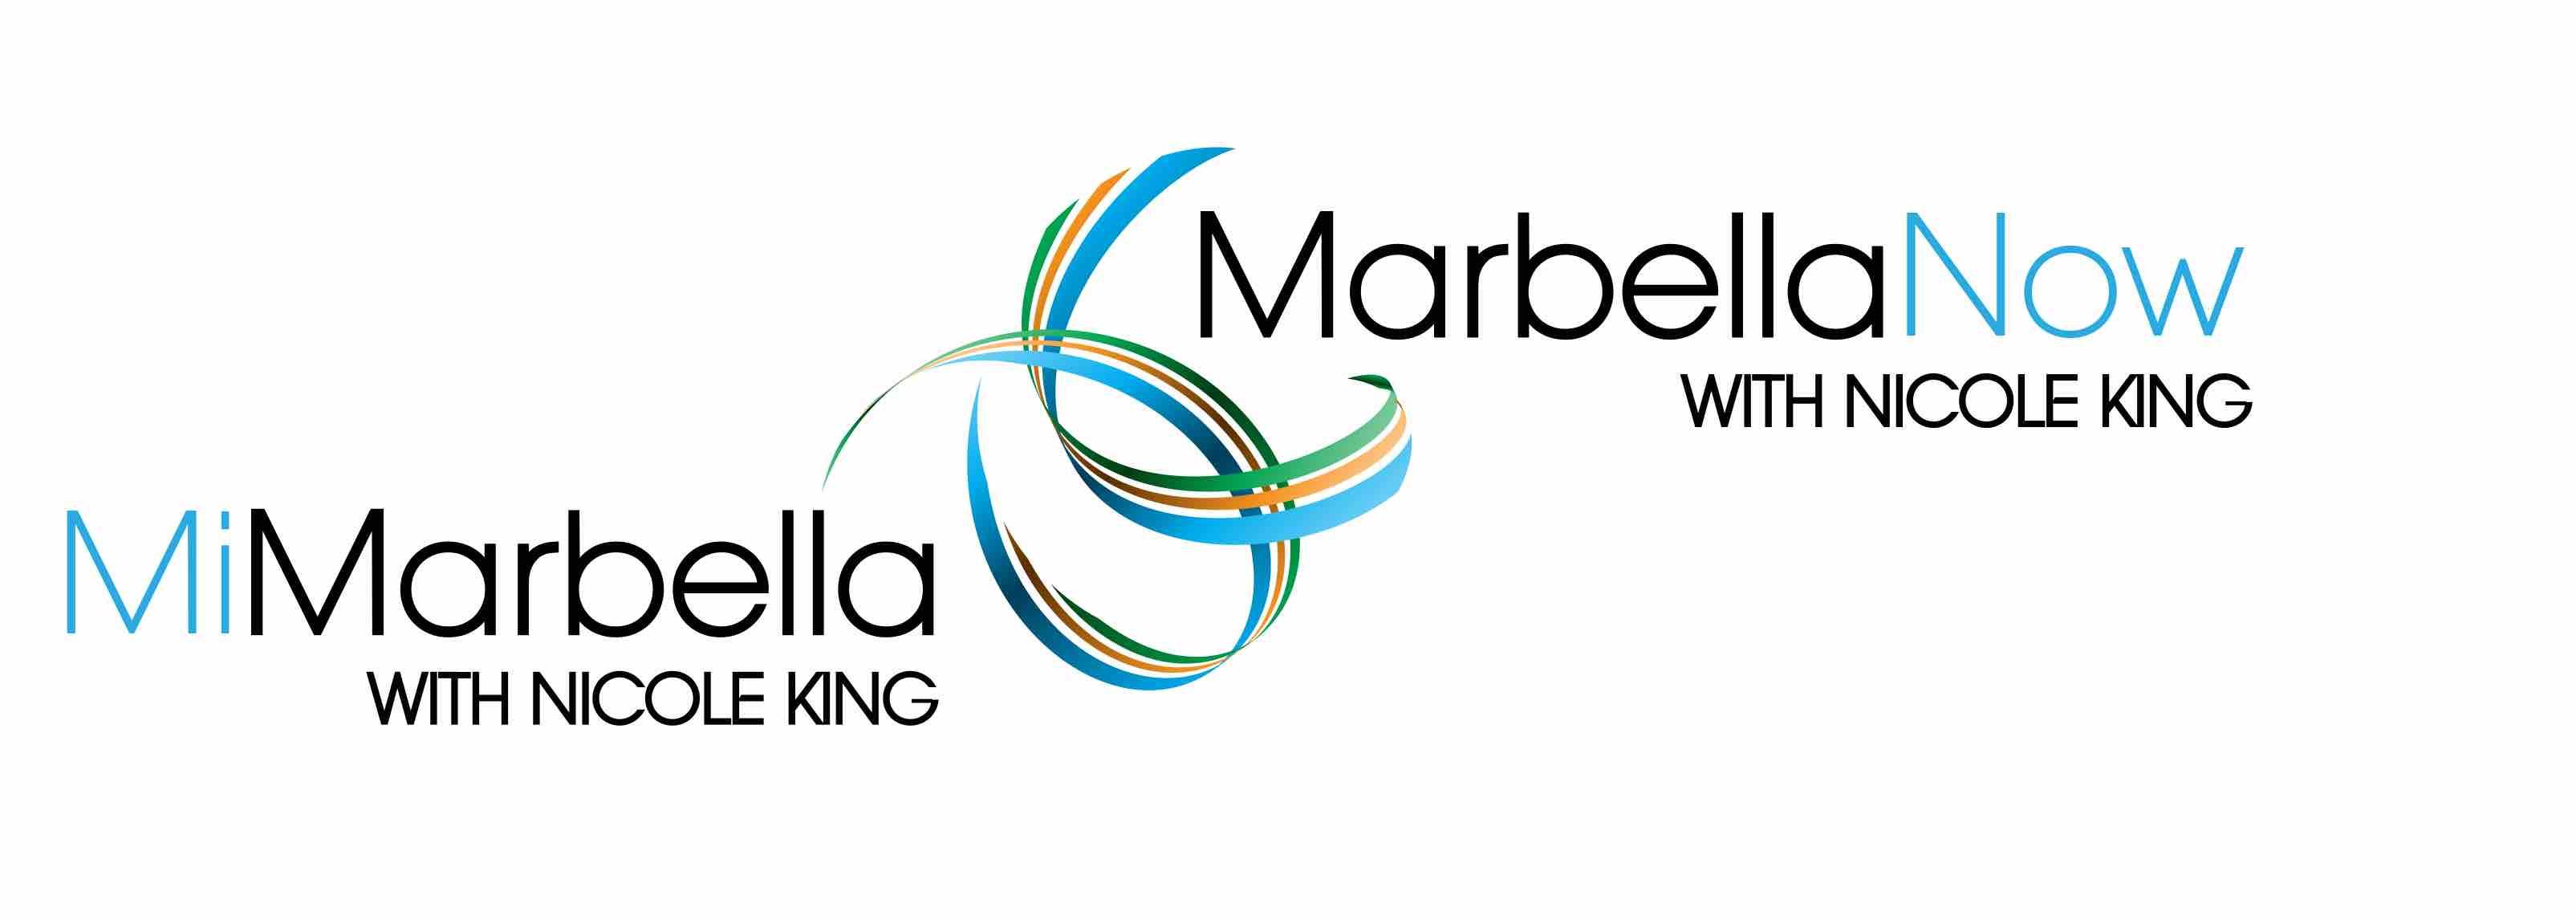 MarbellaNow Television